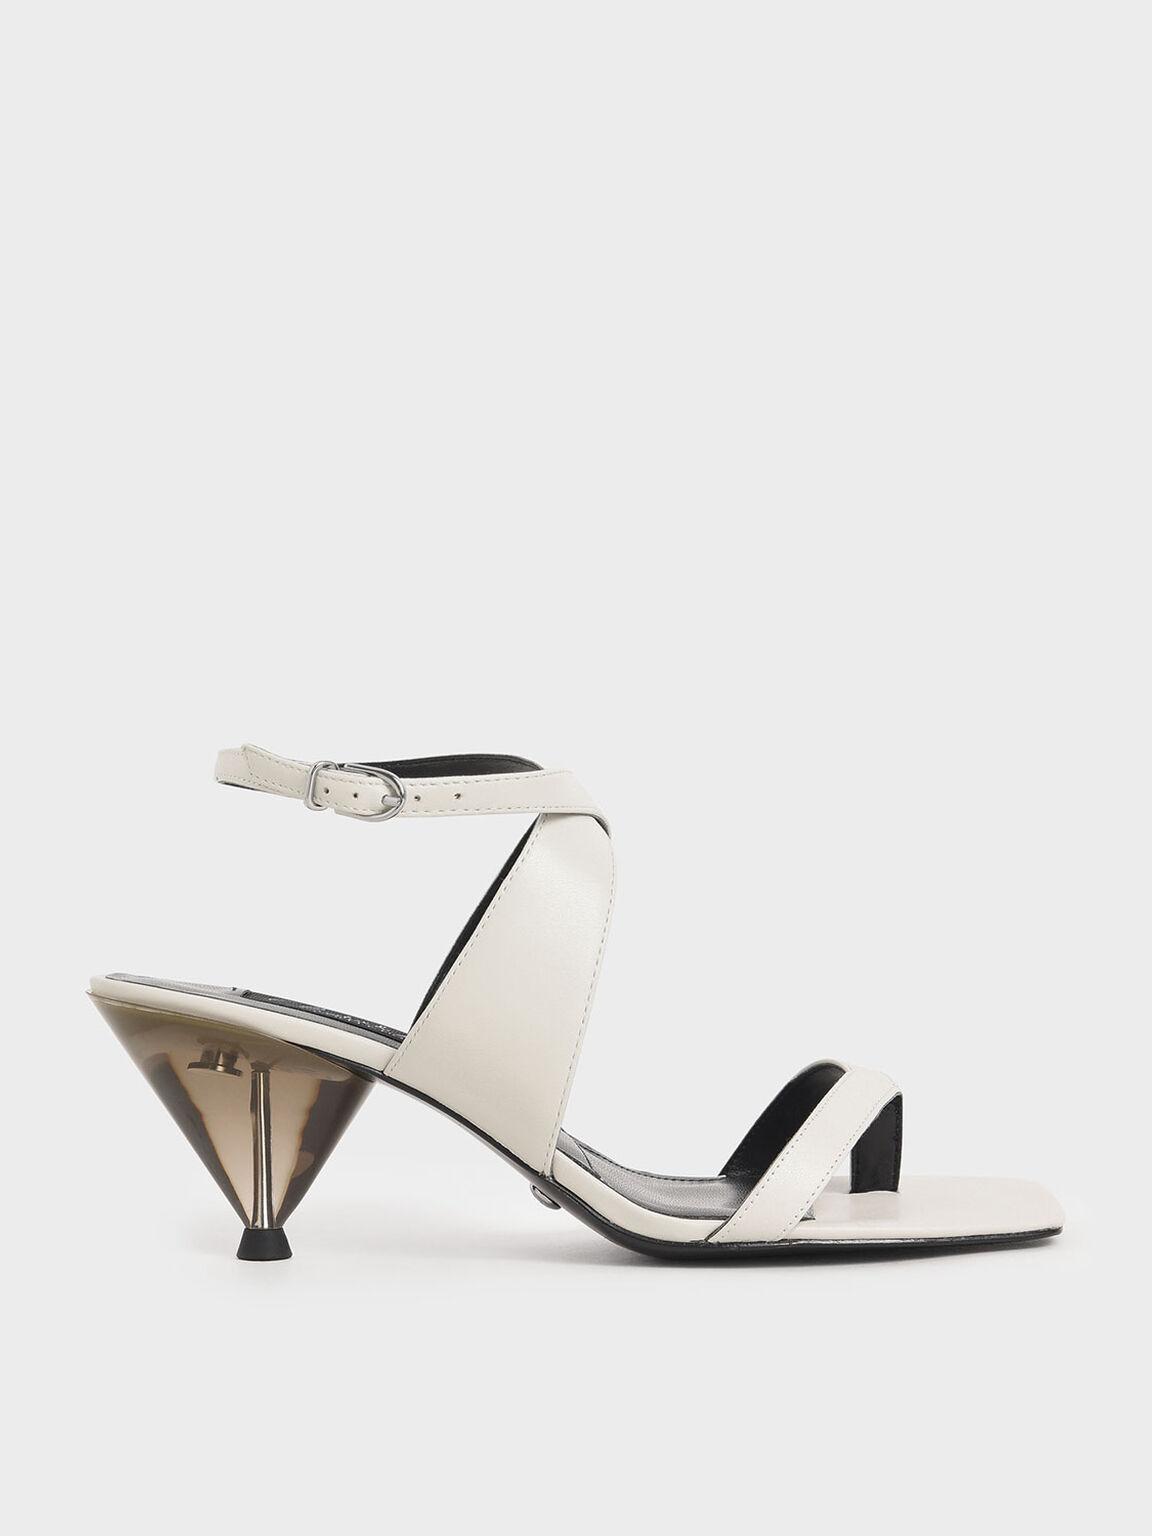 Leather Cone Heel Sandals, White, hi-res